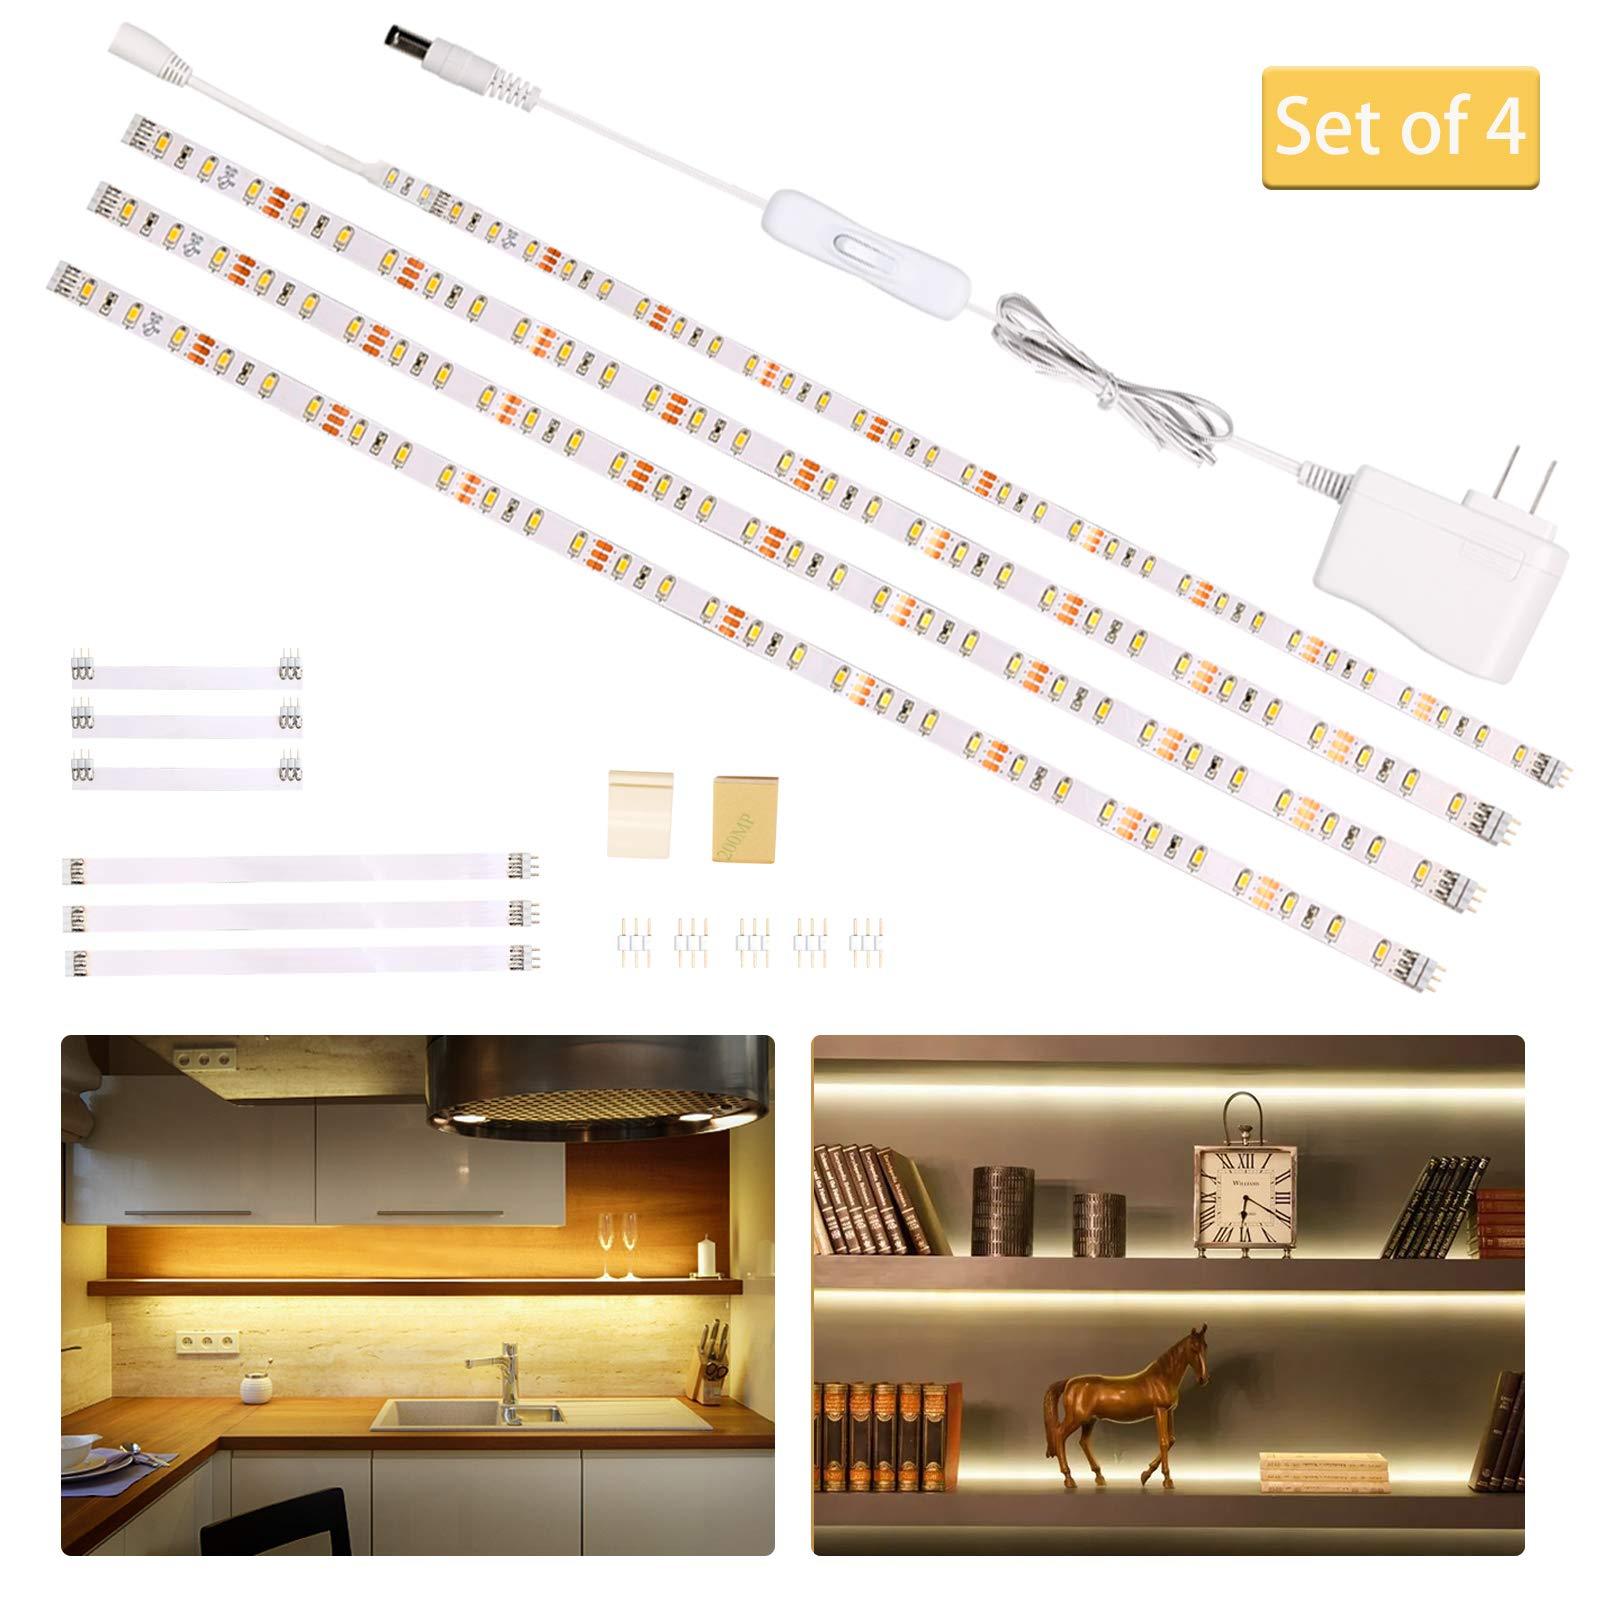 Wobsion Led Under Cabinet Lighting Under Counter Light Bar Led Strip Lights For Kitchen Desk Showcase Shelf Workbench Cupboard Pantry 1100lm 3000k Warmwhite 6 6 Feet Diy Tape Light Kit